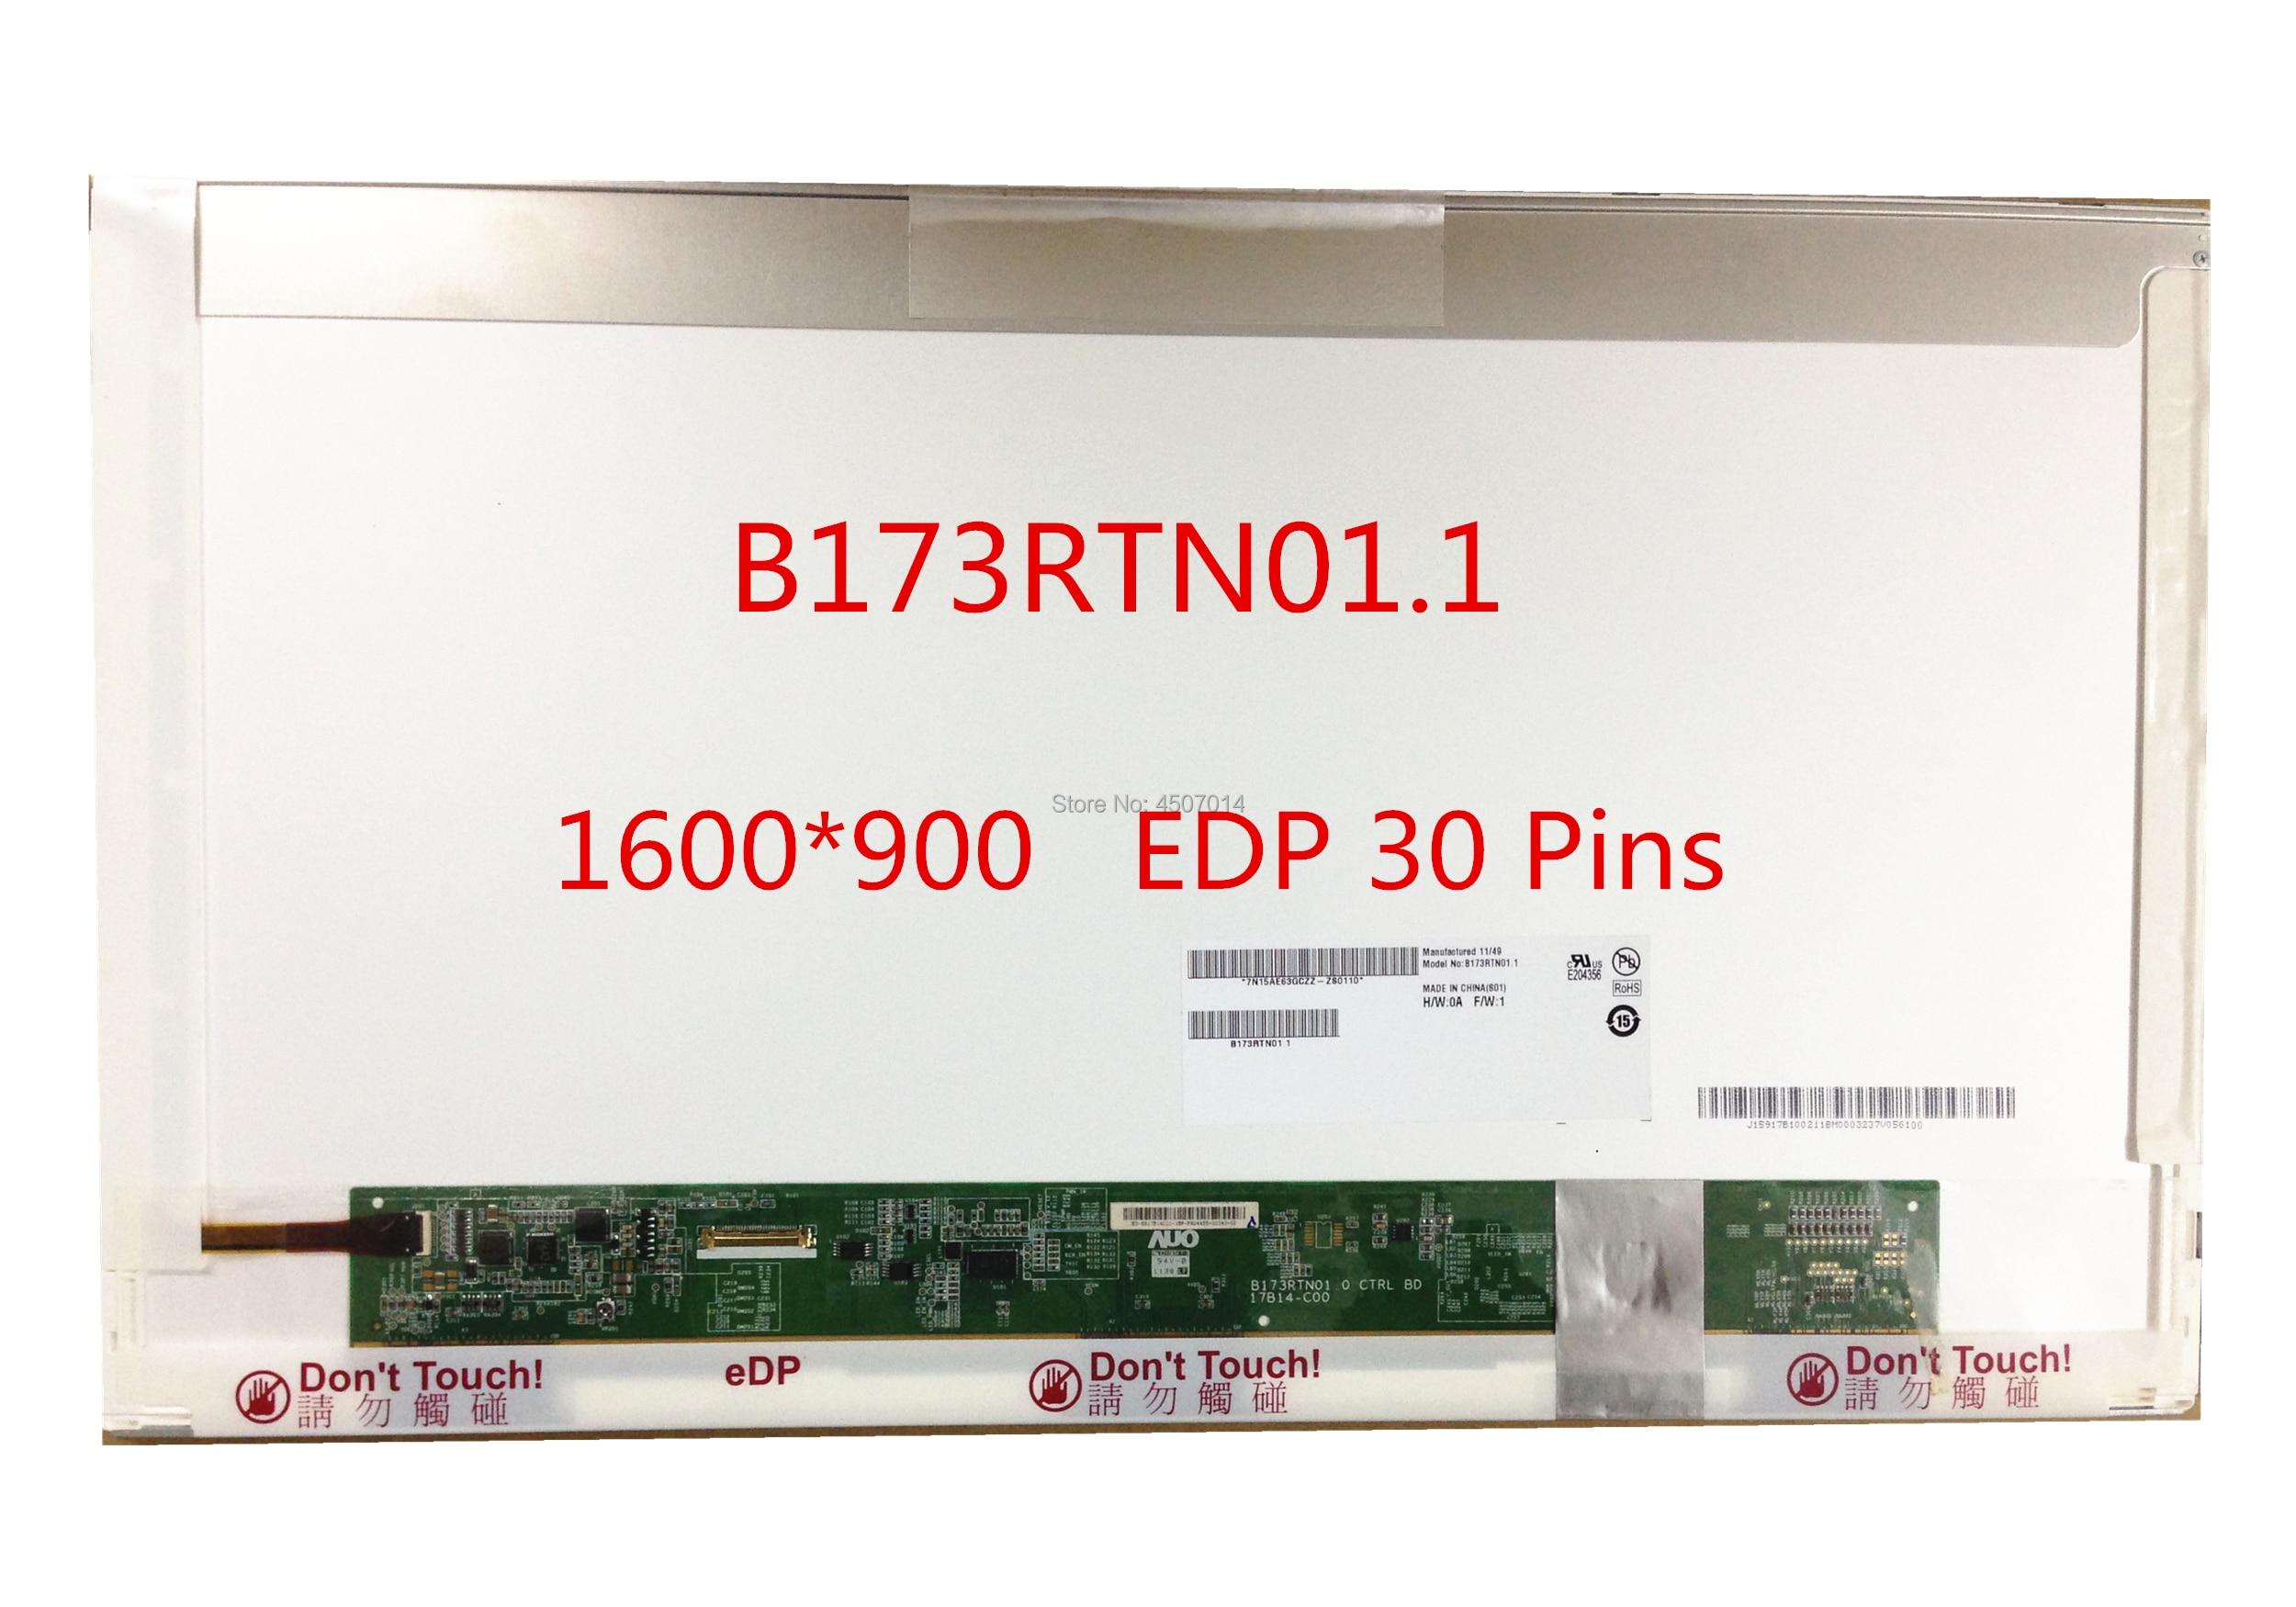 Free shipping B173RTN01.1 B173RTN01.3 B173RTN01.4 N173FGE-E23 LP173WD1 TPA1 TPE1 Laptop Lcd Screen 1600*900 EDP 30 PinsFree shipping B173RTN01.1 B173RTN01.3 B173RTN01.4 N173FGE-E23 LP173WD1 TPA1 TPE1 Laptop Lcd Screen 1600*900 EDP 30 Pins